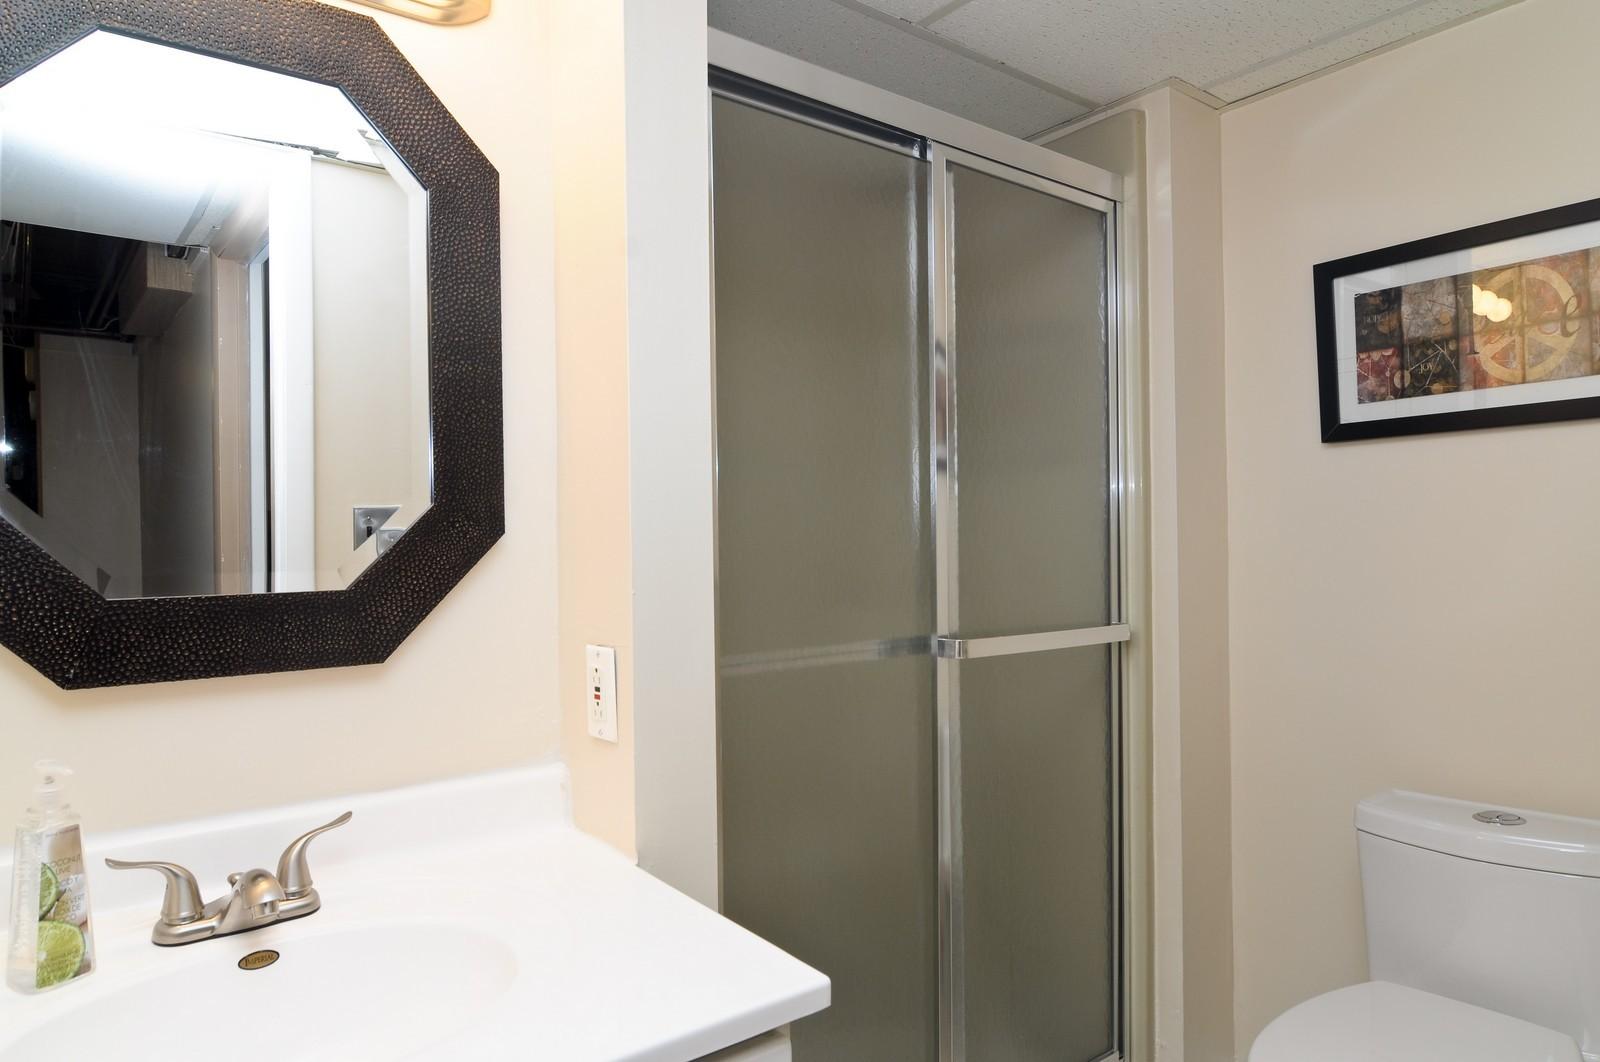 Real Estate Photography - 240 Sharon Dr, Barrington, IL, 60010 - Bathroom